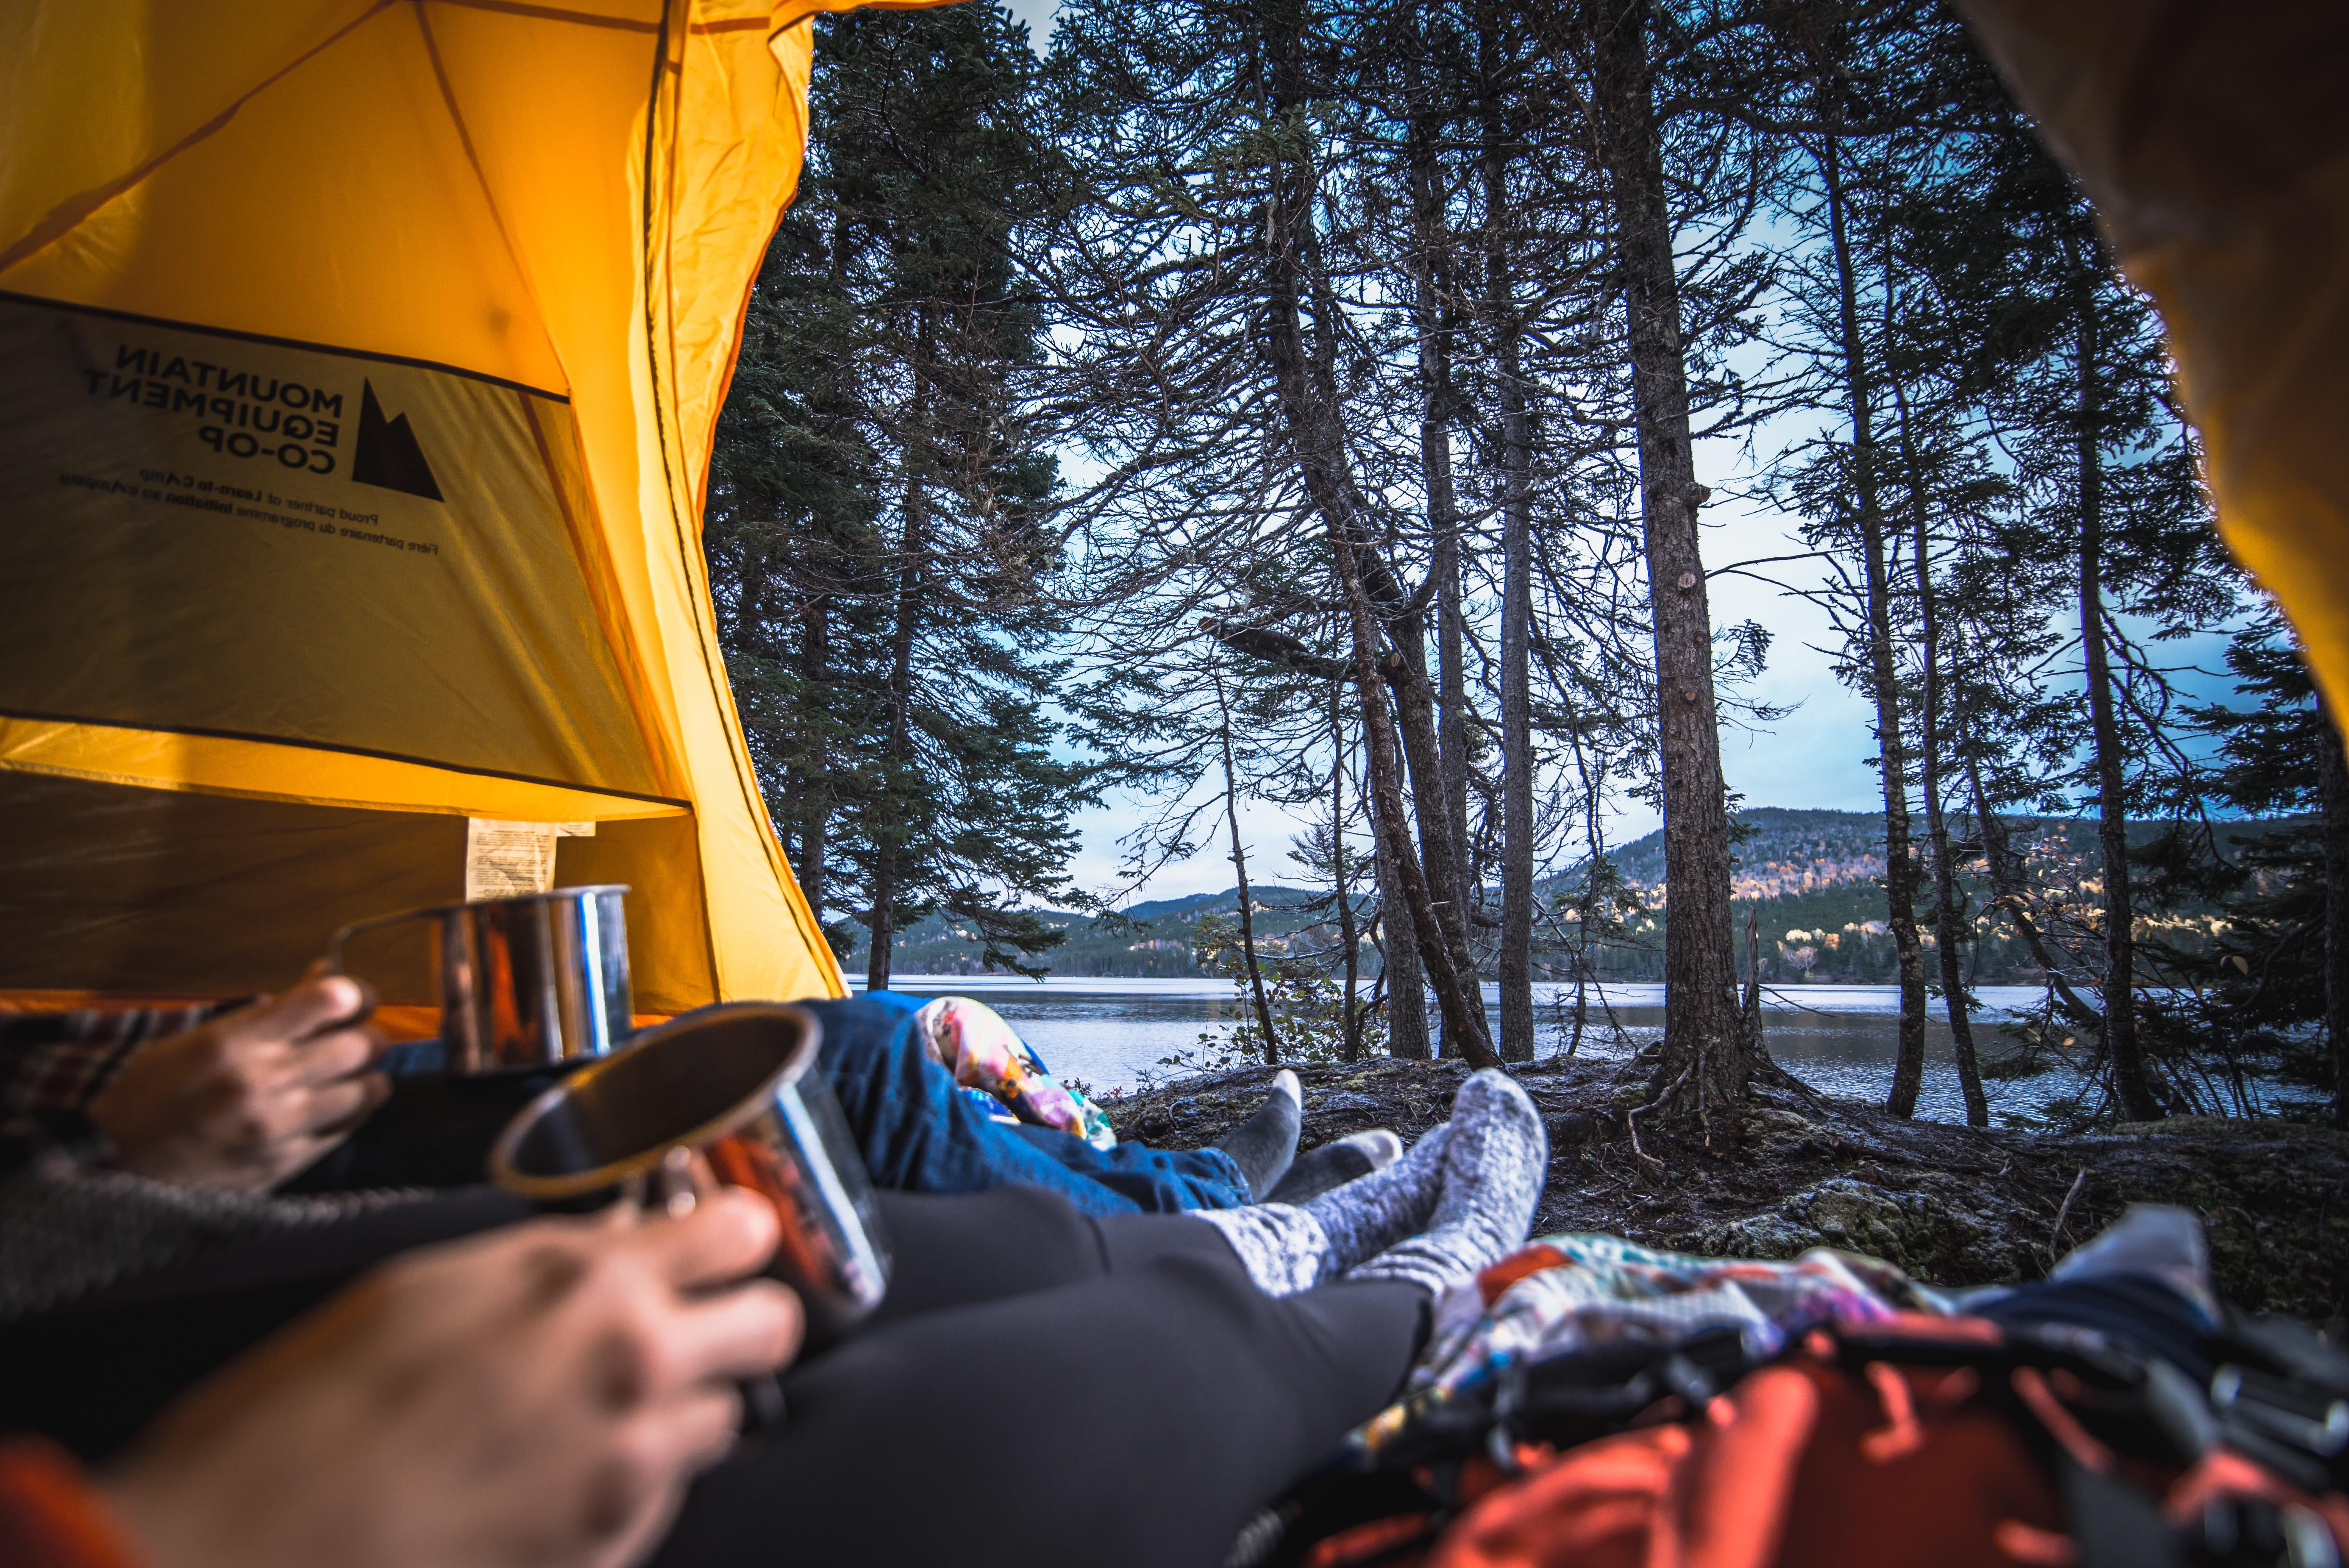 Morning Glory at Campsite at  Terra Nova National Park